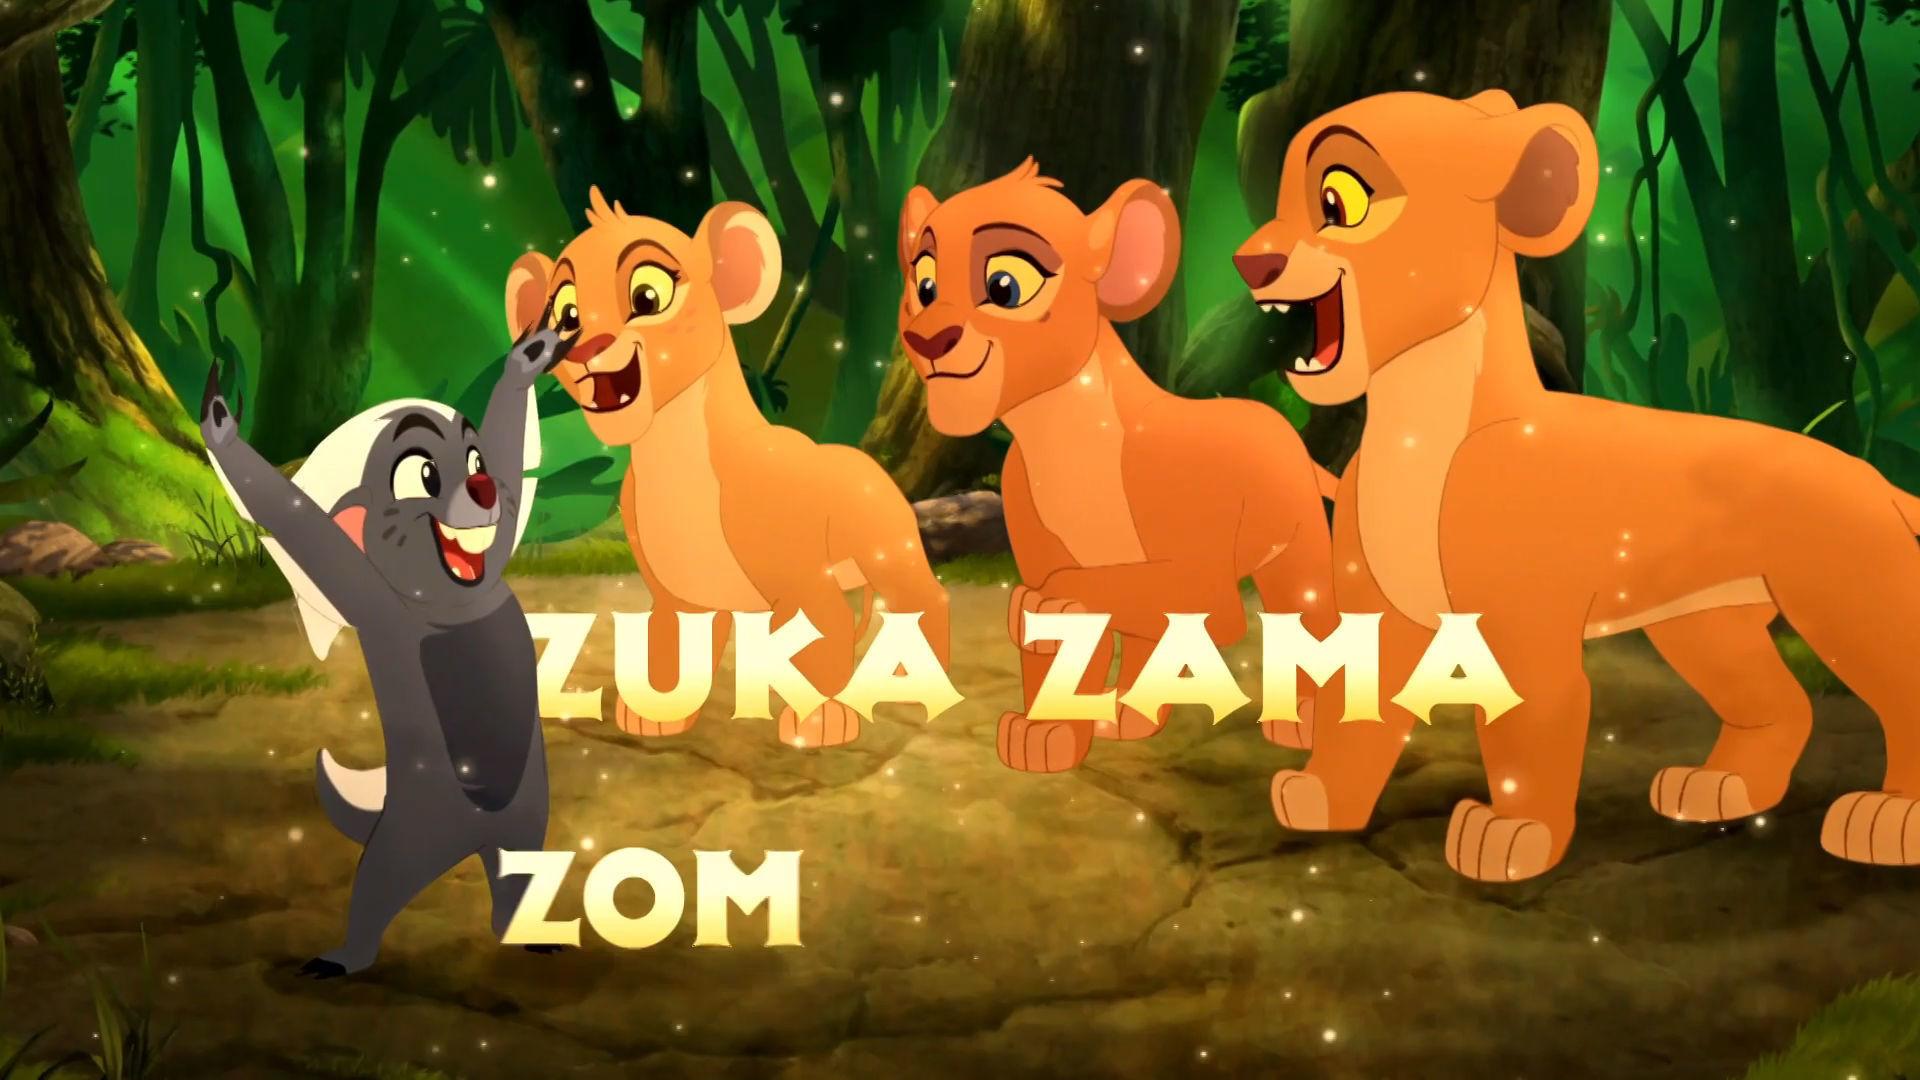 The Lion Guard: Return of the Roar - Get Ready to Zuka Zama!